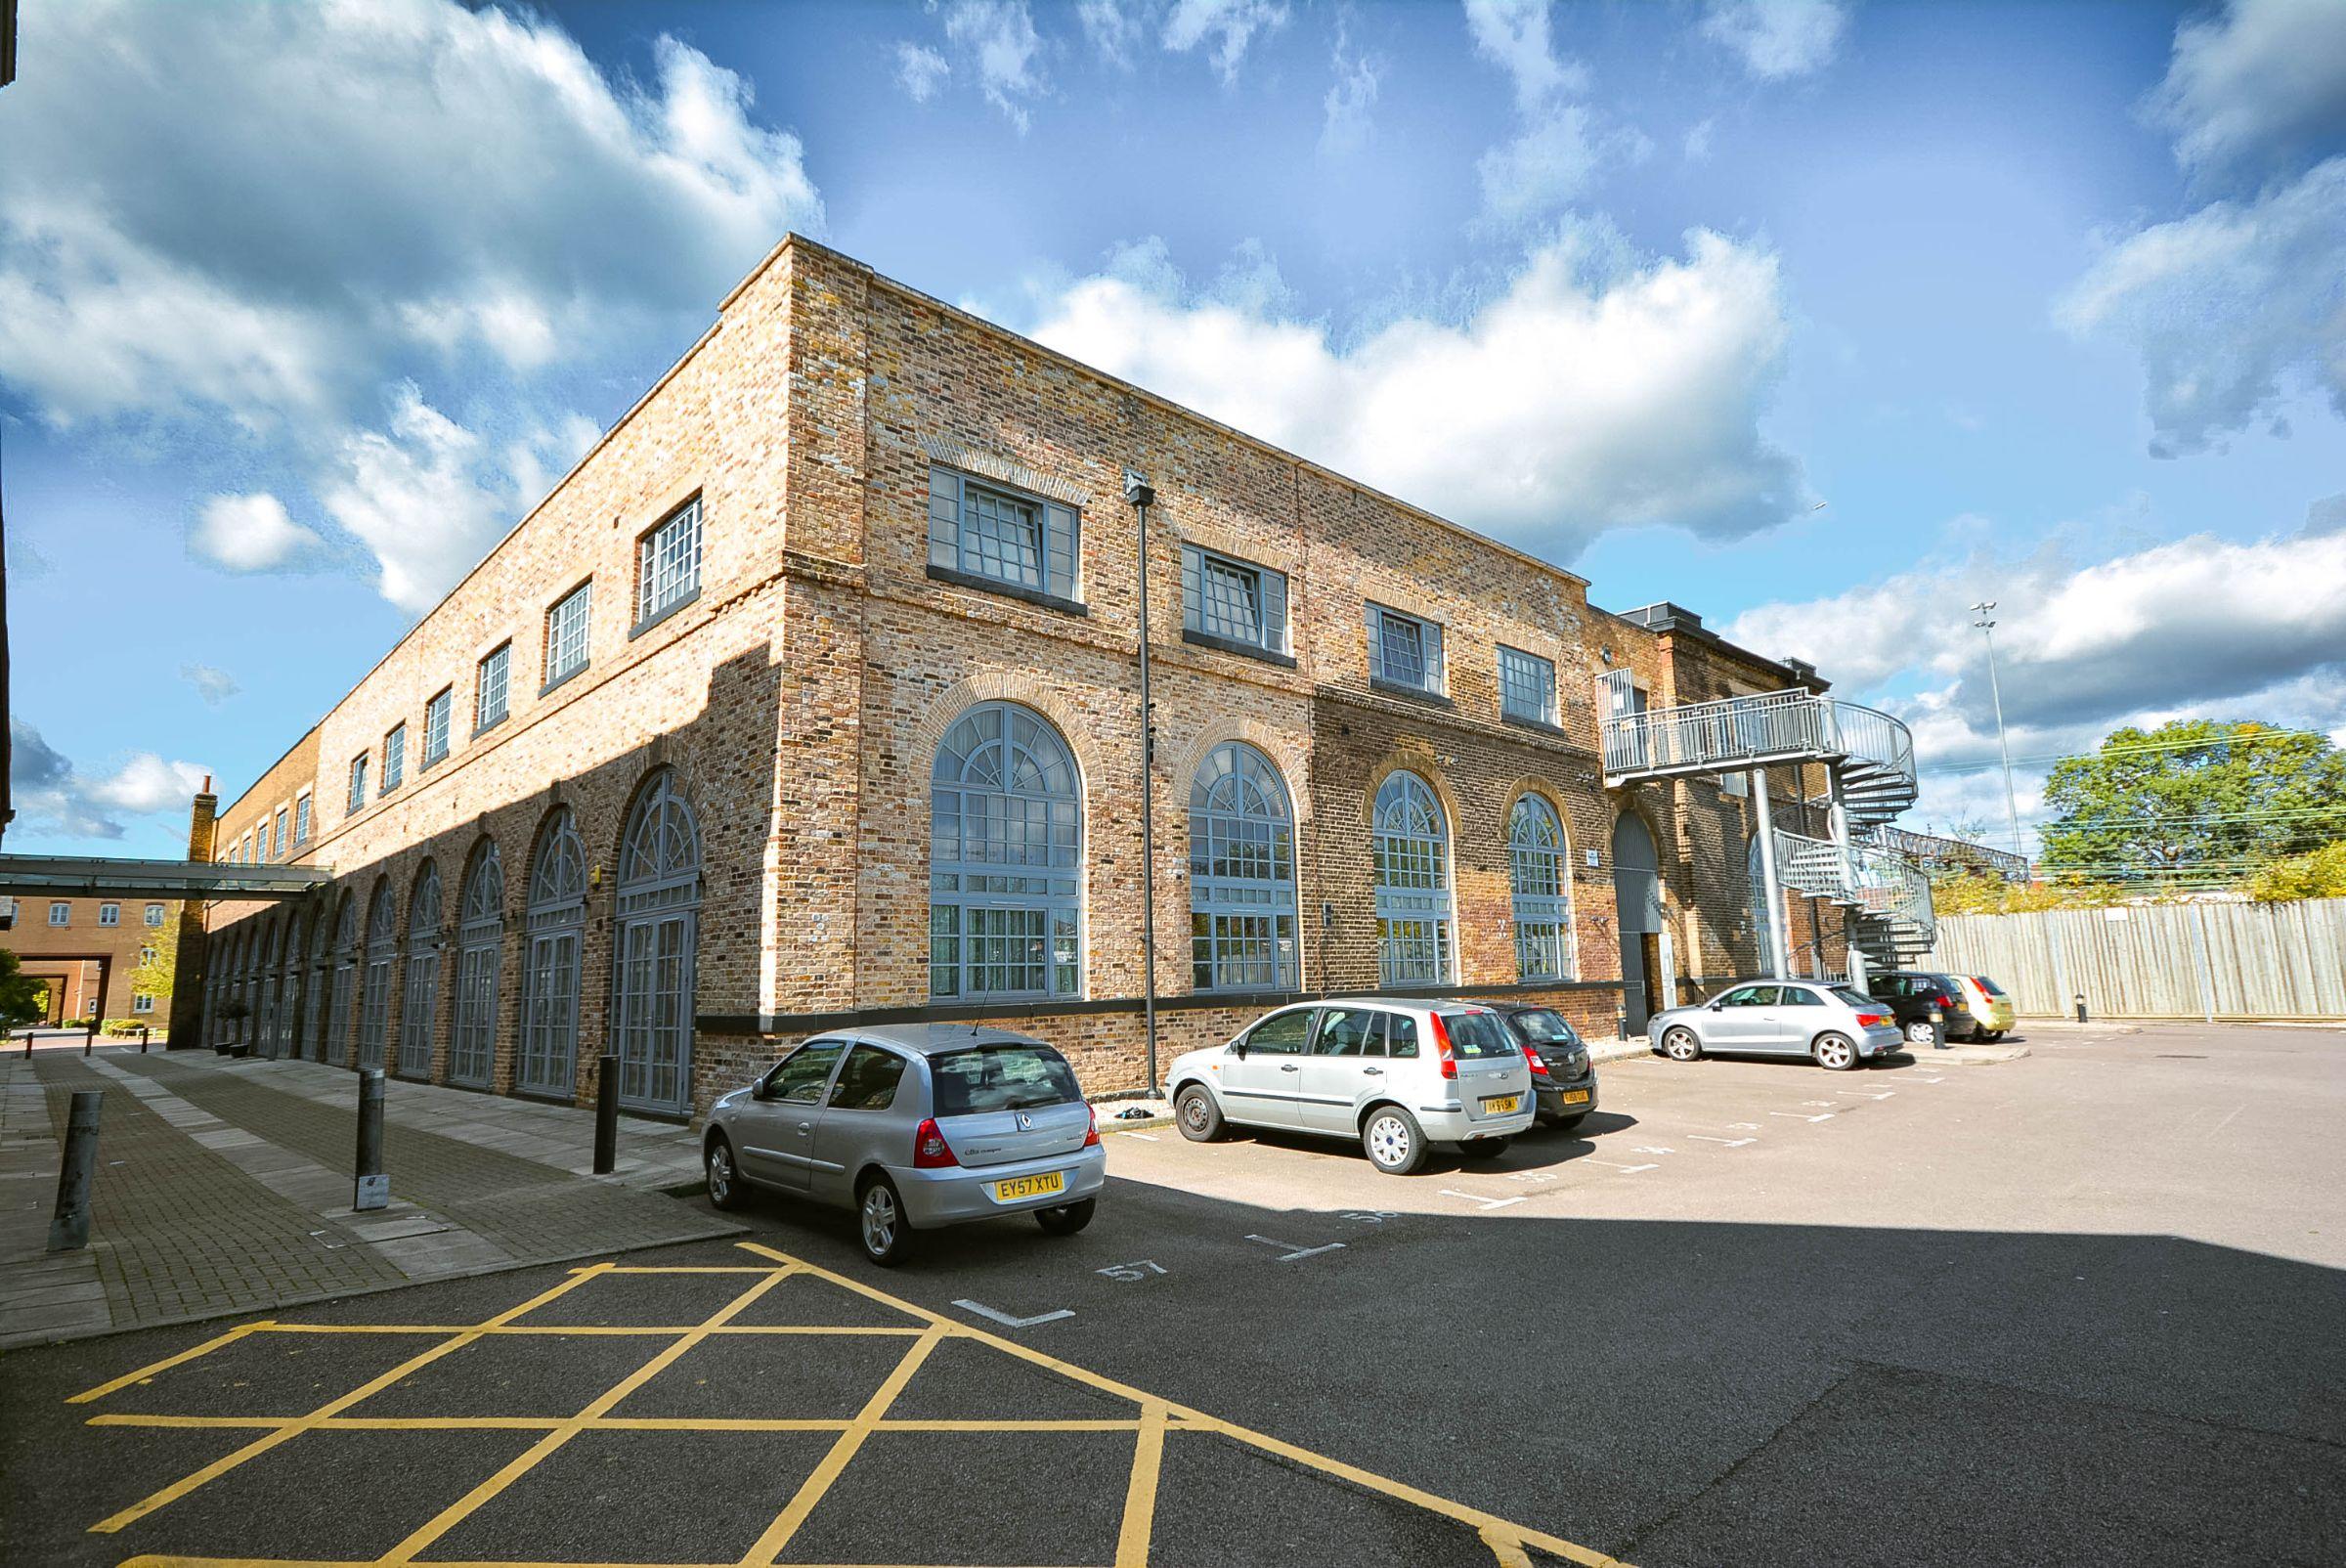 North Block, The Railstore, Kidman Close, Gidea Park, Romford